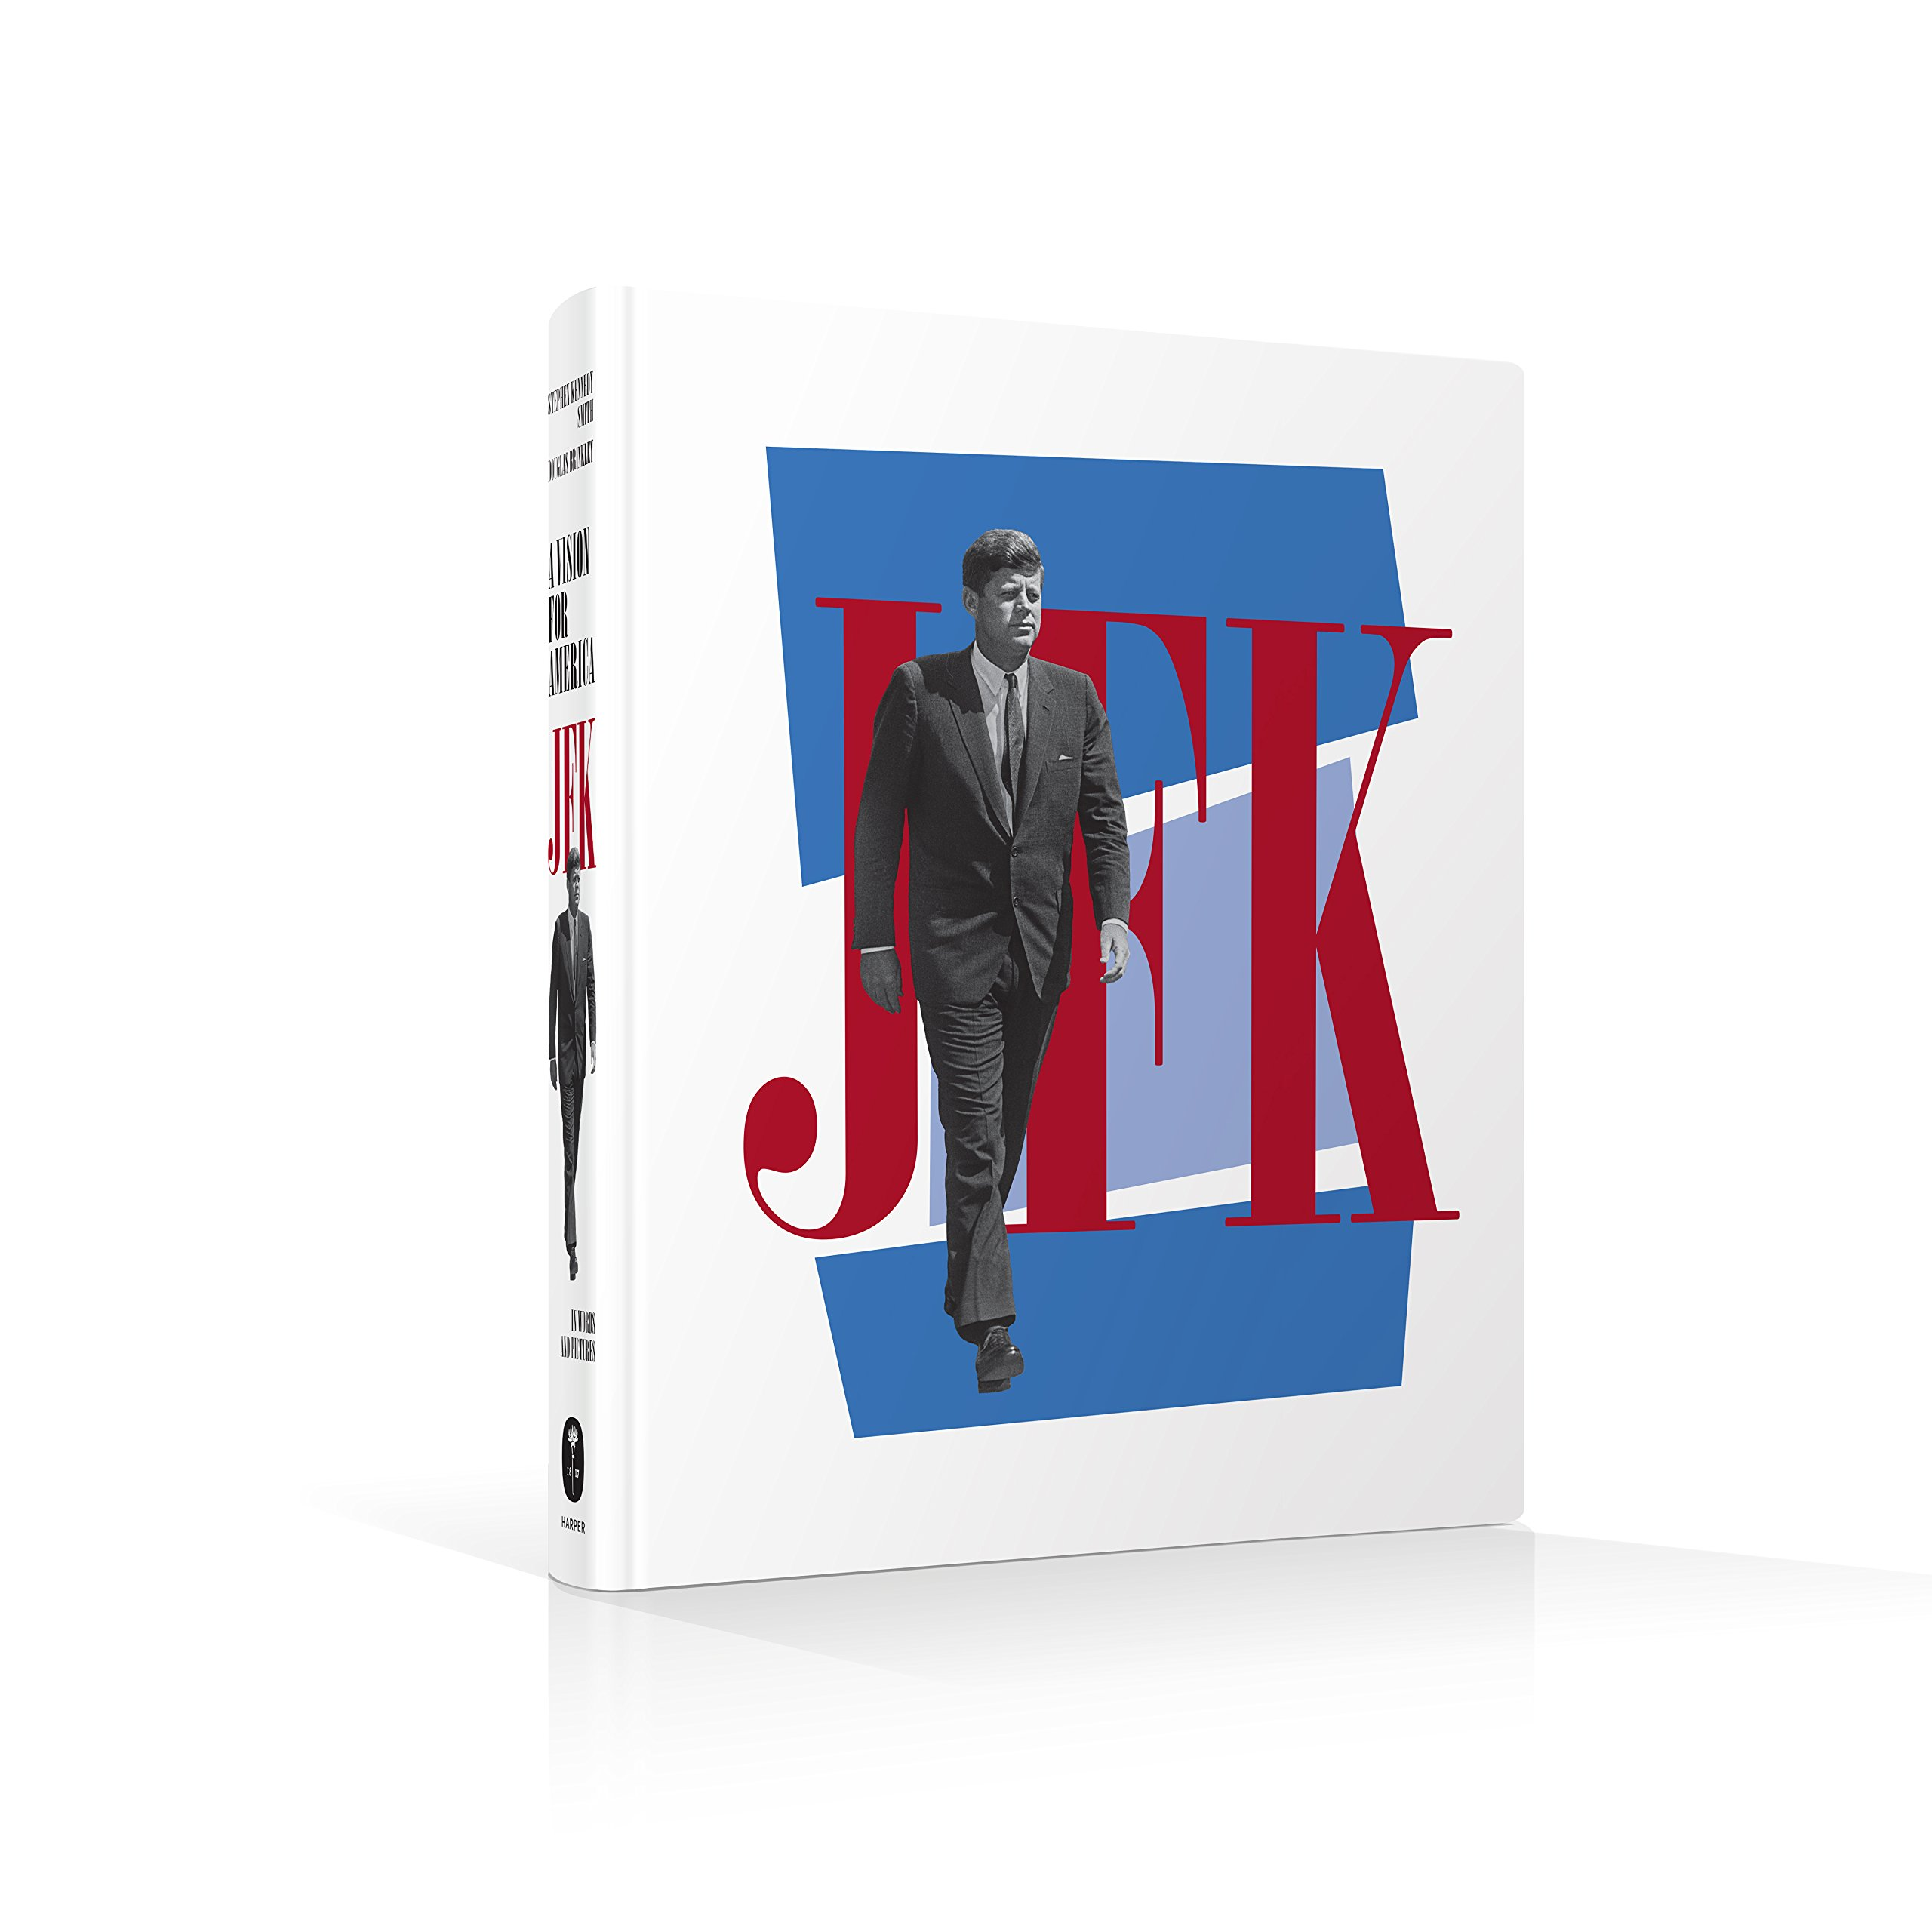 Jfk a vision for america stephen smith douglas brinkley jfk a vision for america stephen smith douglas brinkley 9780062668844 amazon books geotapseo Choice Image